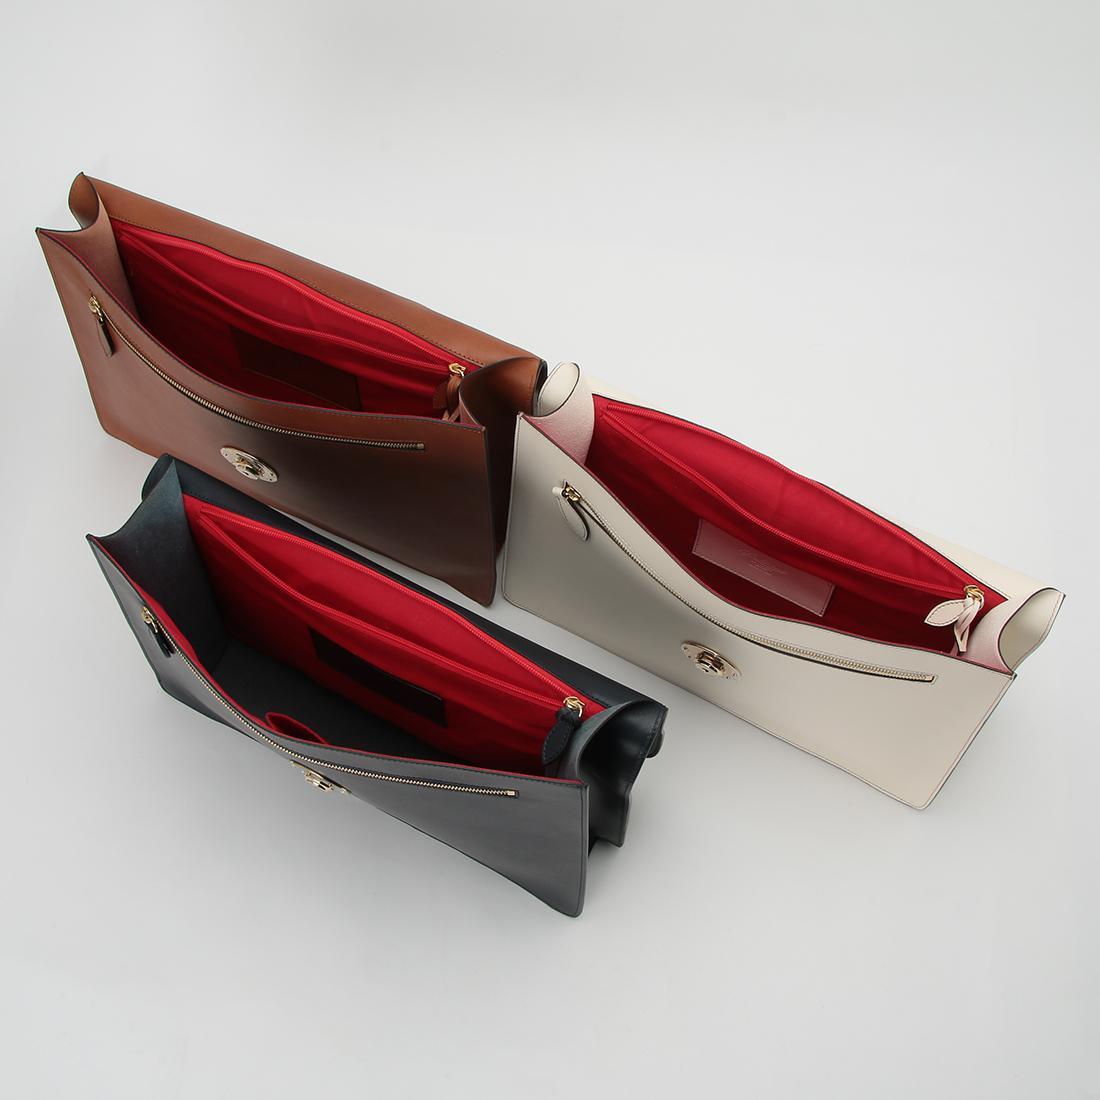 Boldrini Selleria Structured Briefcase: Light Brown, Navy, White